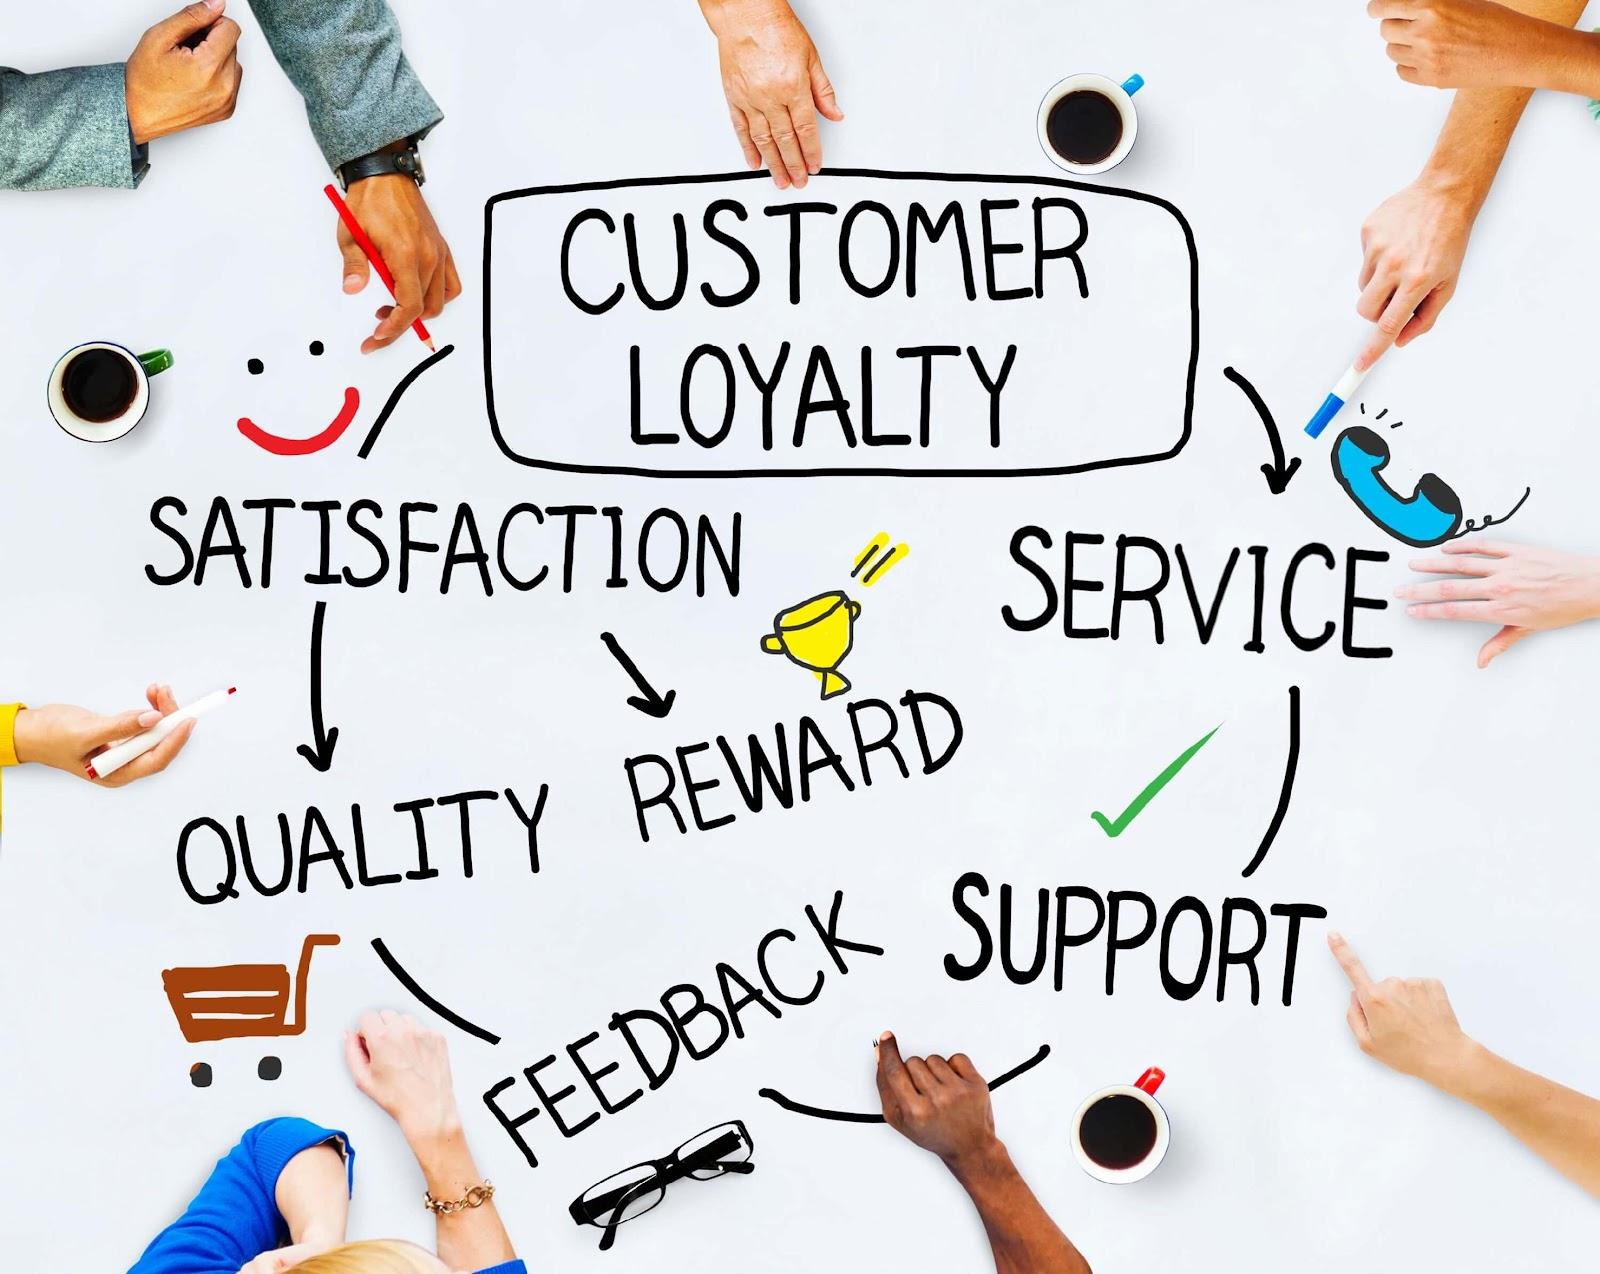 http://www.swotdigital.com/wp-content/uploads/2017/10/Customer-Loyalty-1.jpg